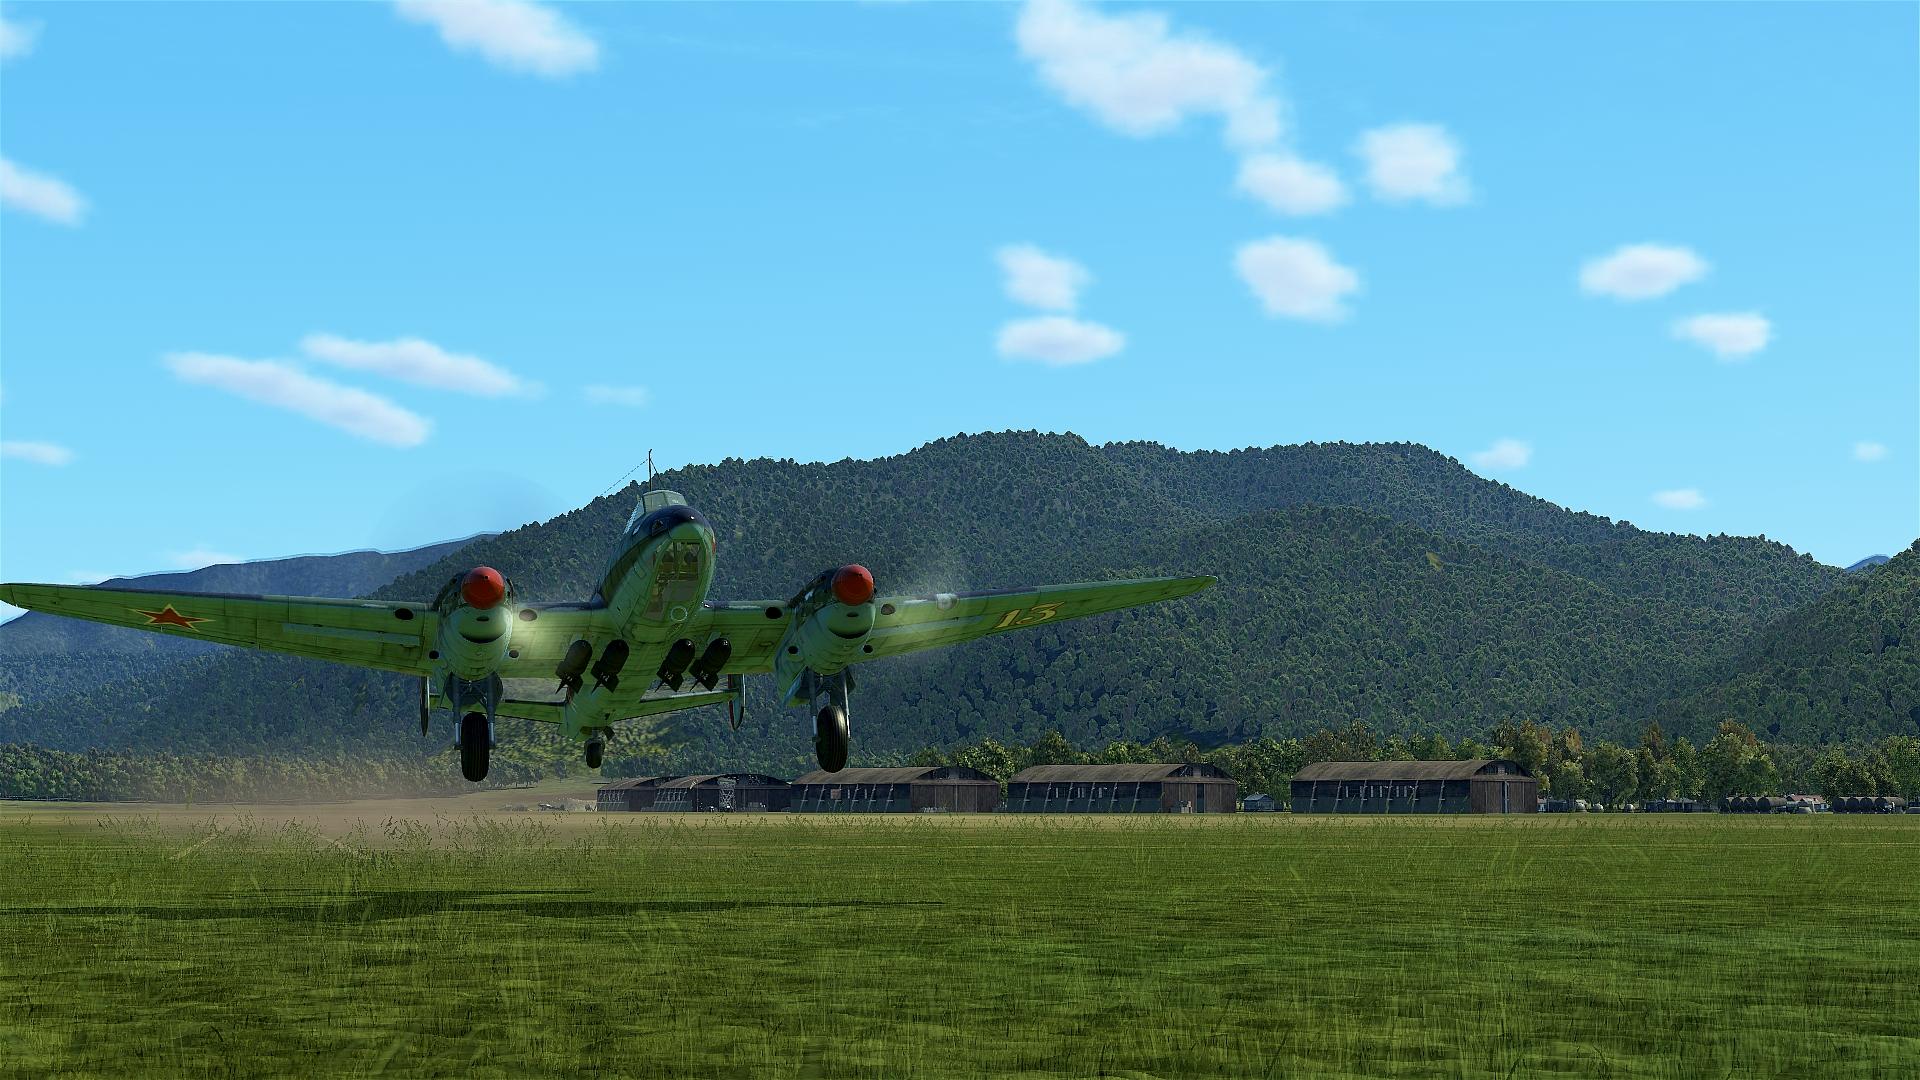 Un ptit CR en image de  la sortie de vendredi sur les Fnbf avec les NN en bomber ! 41560317562_3ec7b5699c_o